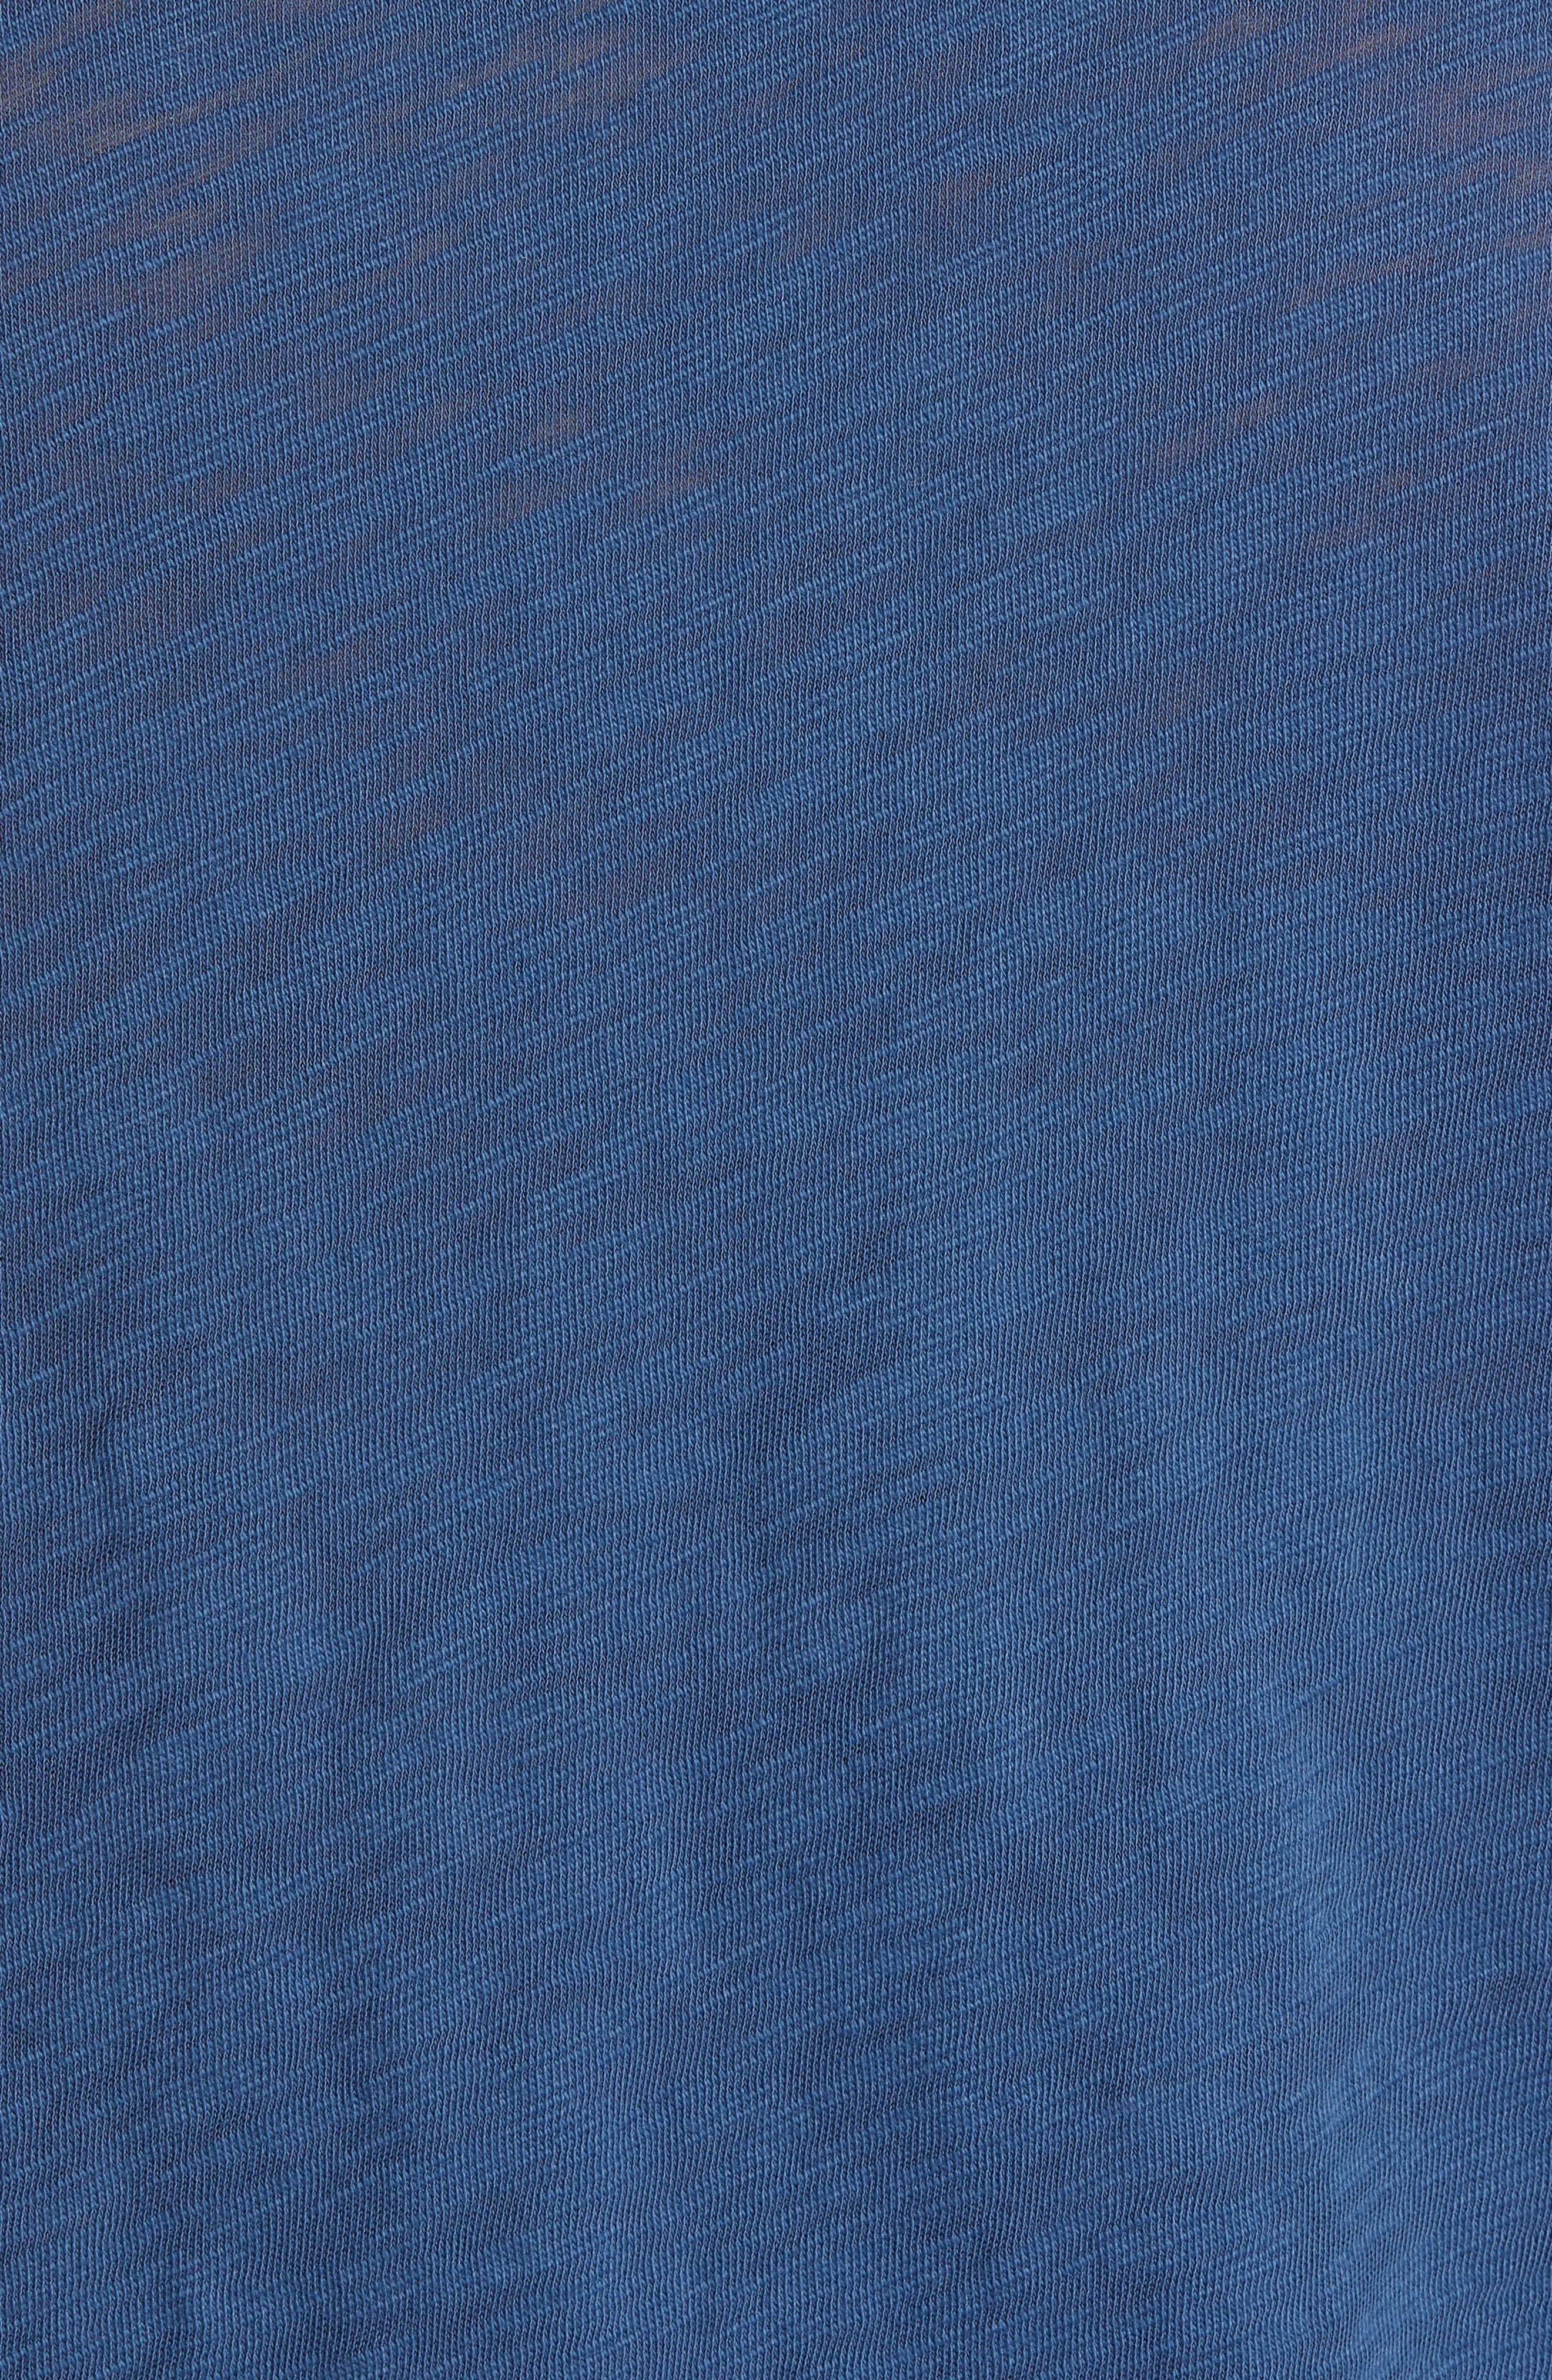 Destroyed Long Sleeve T-Shirt,                             Alternate thumbnail 5, color,                             DEEP OCEAN